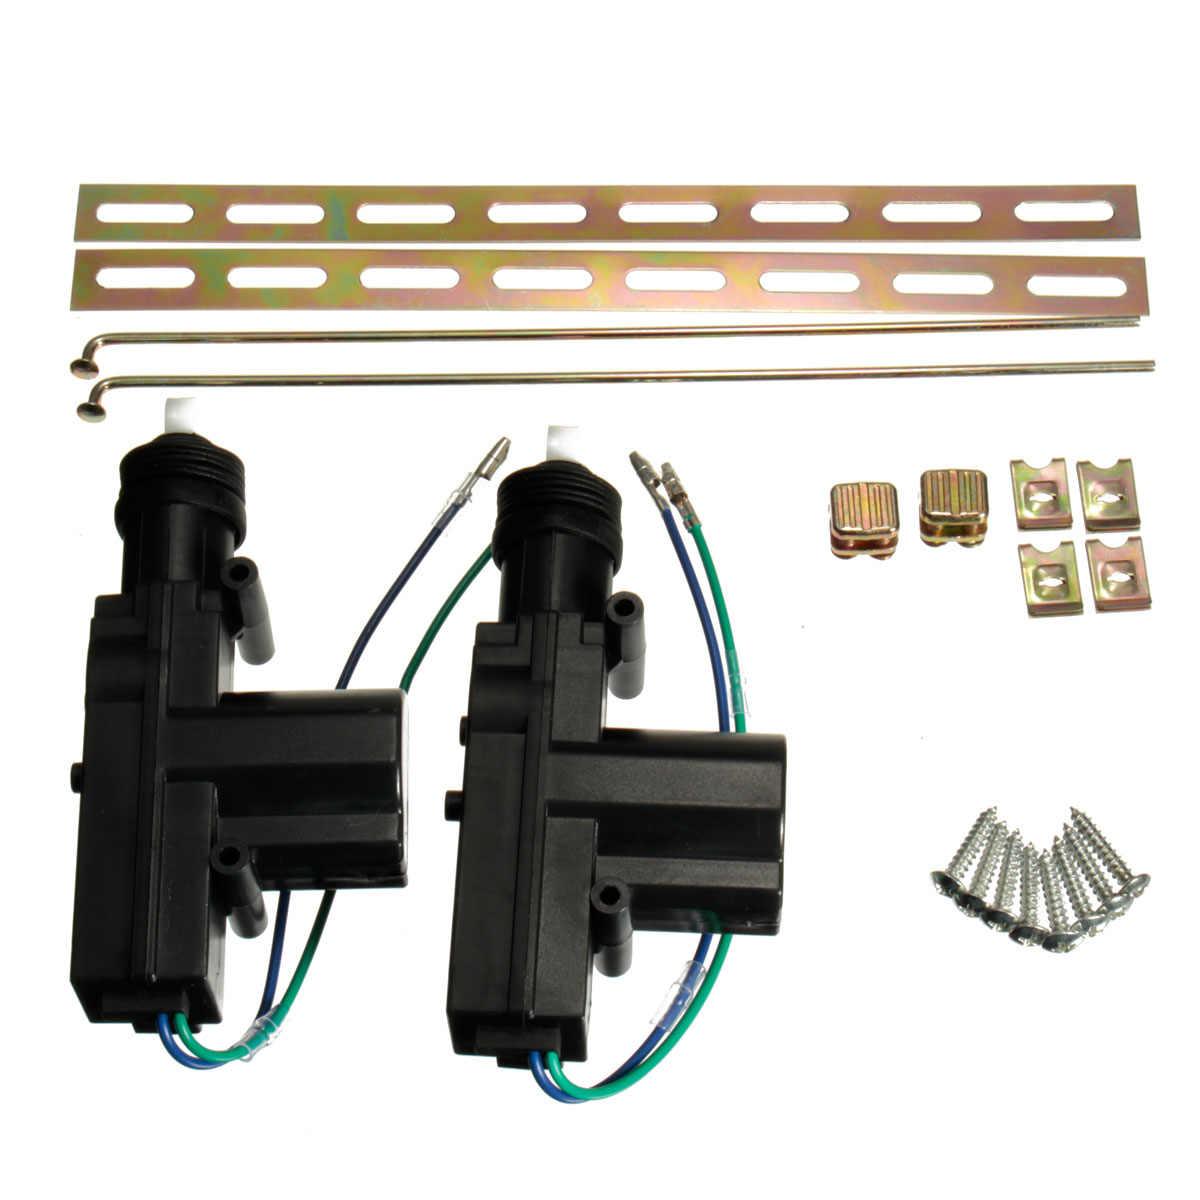 Vodool 2pcs 12v 2 Wire Car Door Remote Central Lock Motor Actuator Kit Auto Vehicle Central Locking System Motor Gun Accessories Kit Kits Kit For Carkit Car Kit Aliexpress